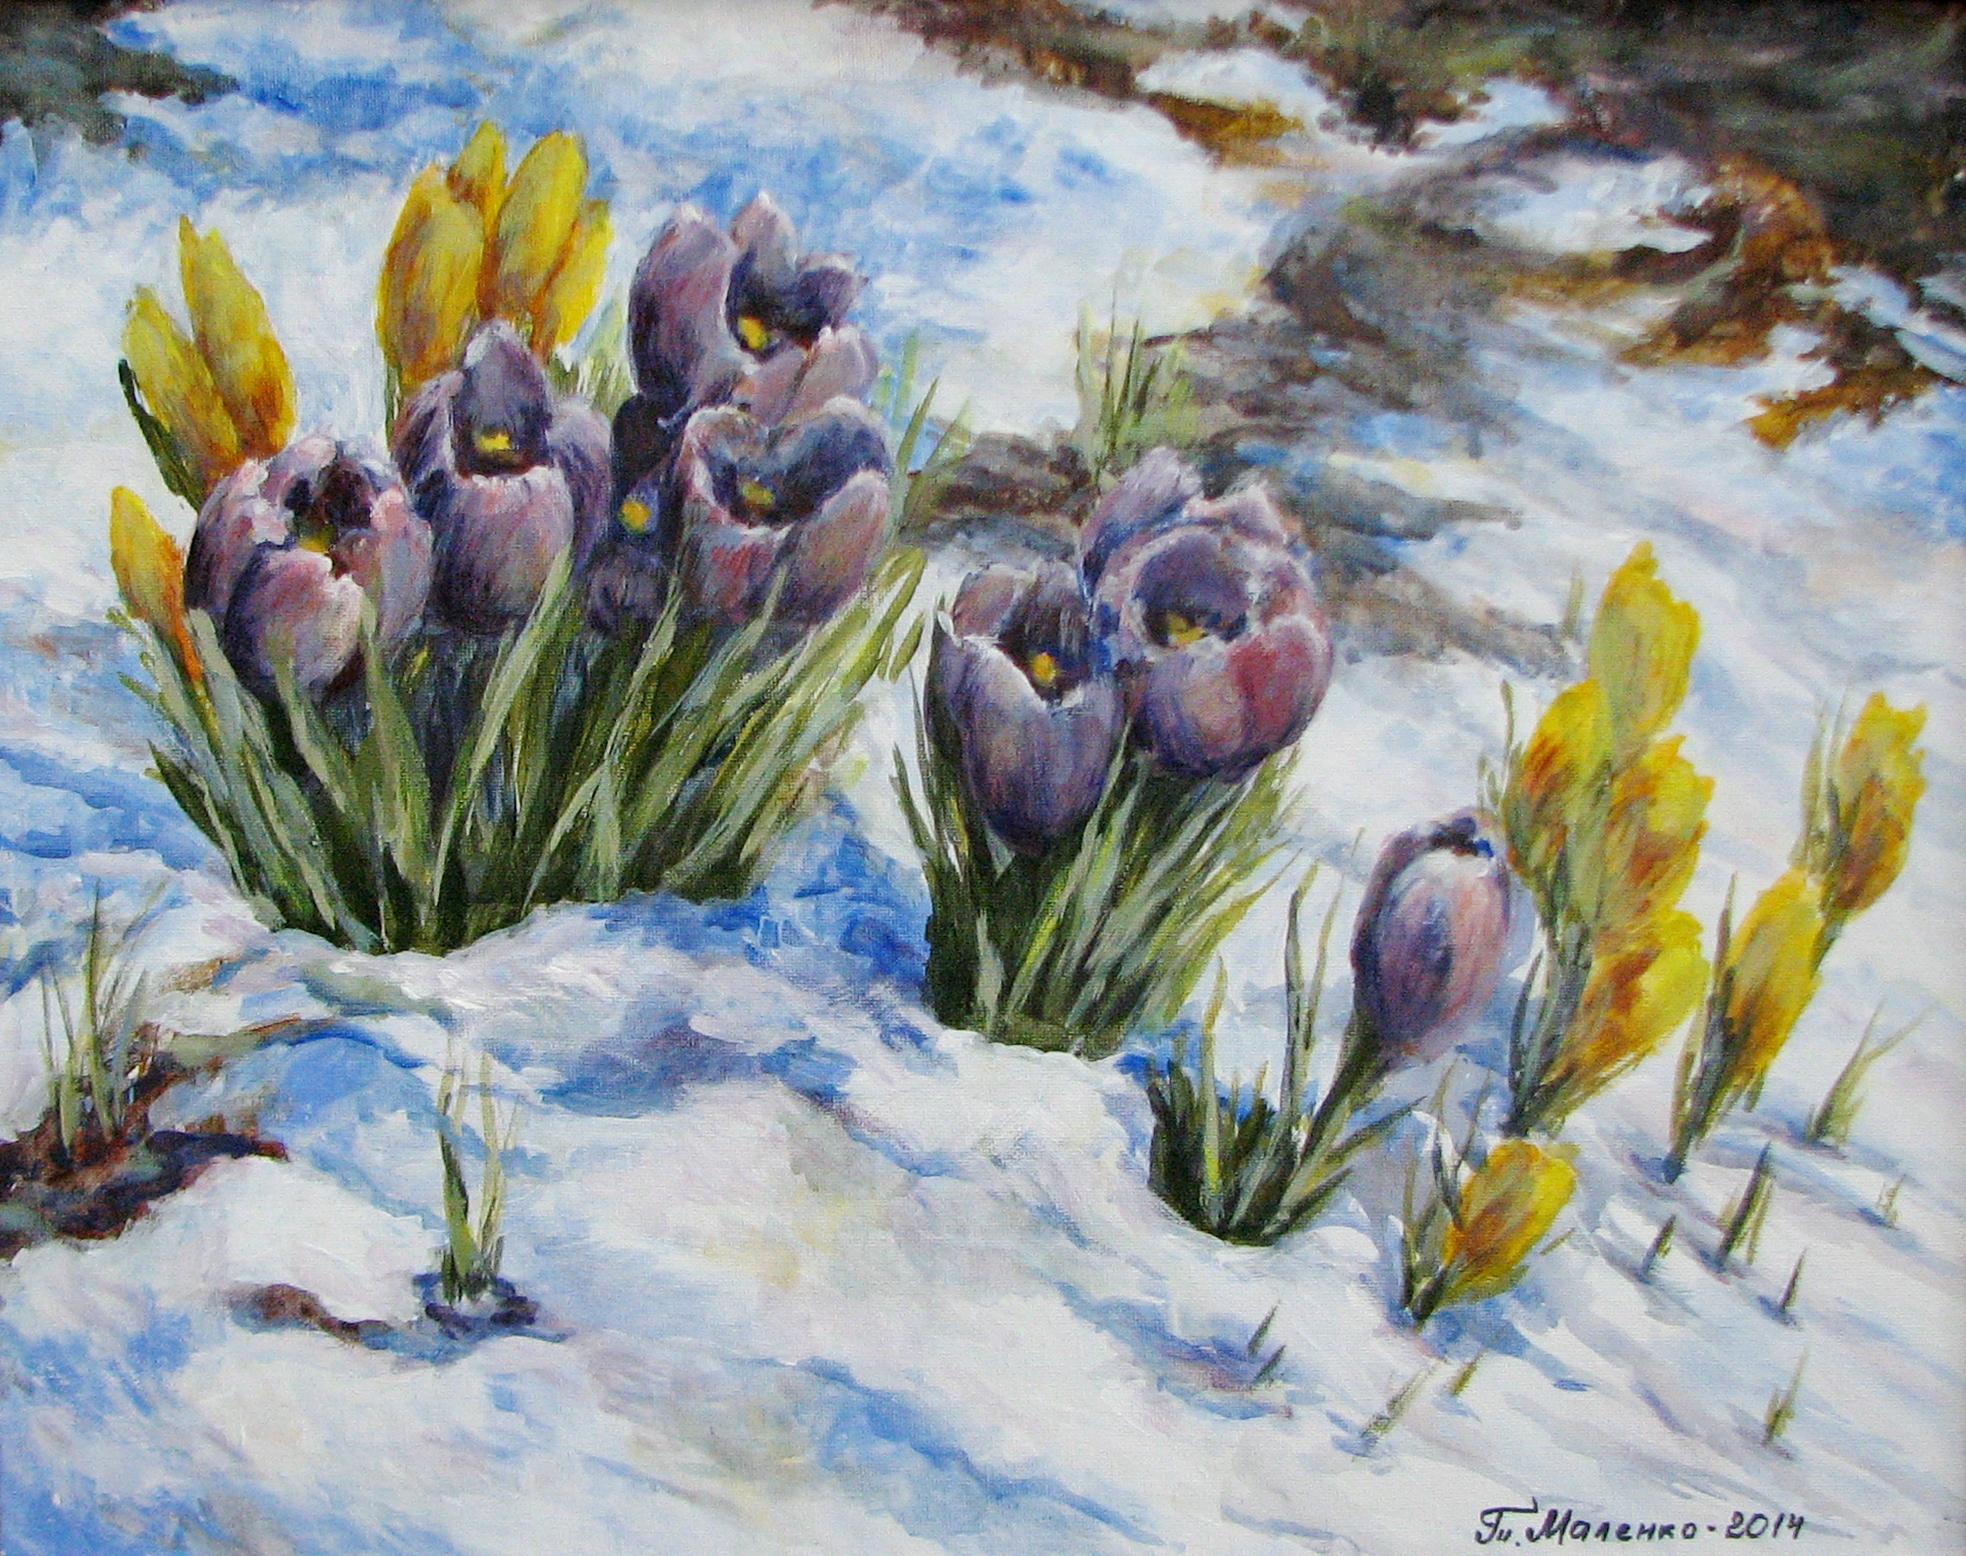 Маленко_Весна идёт2014